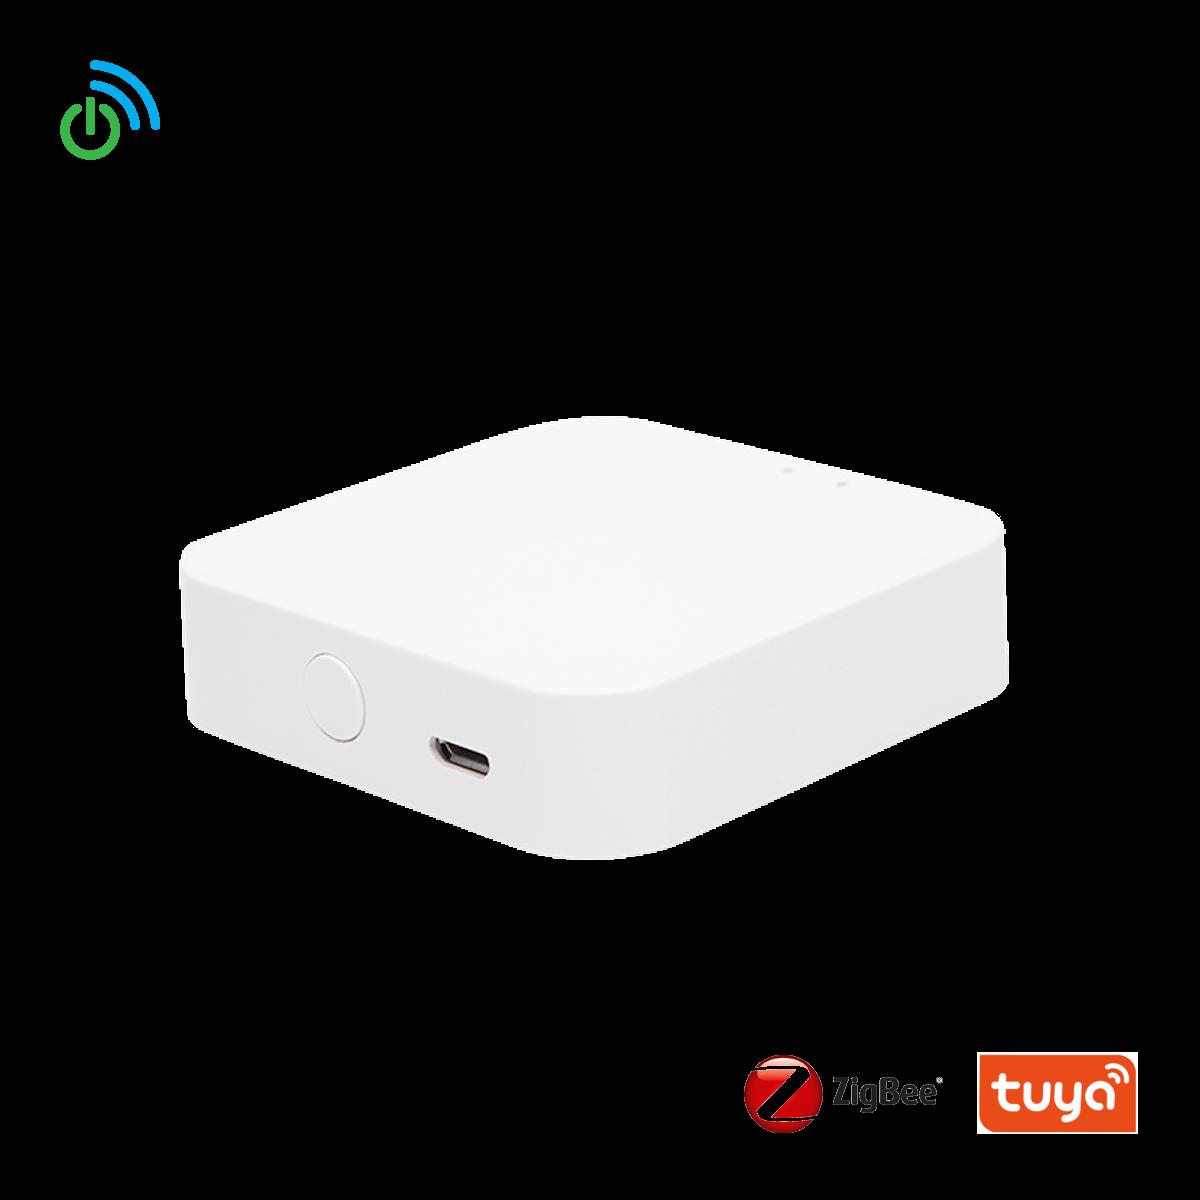 Tuya WiFi ZigBee Hub Revogi